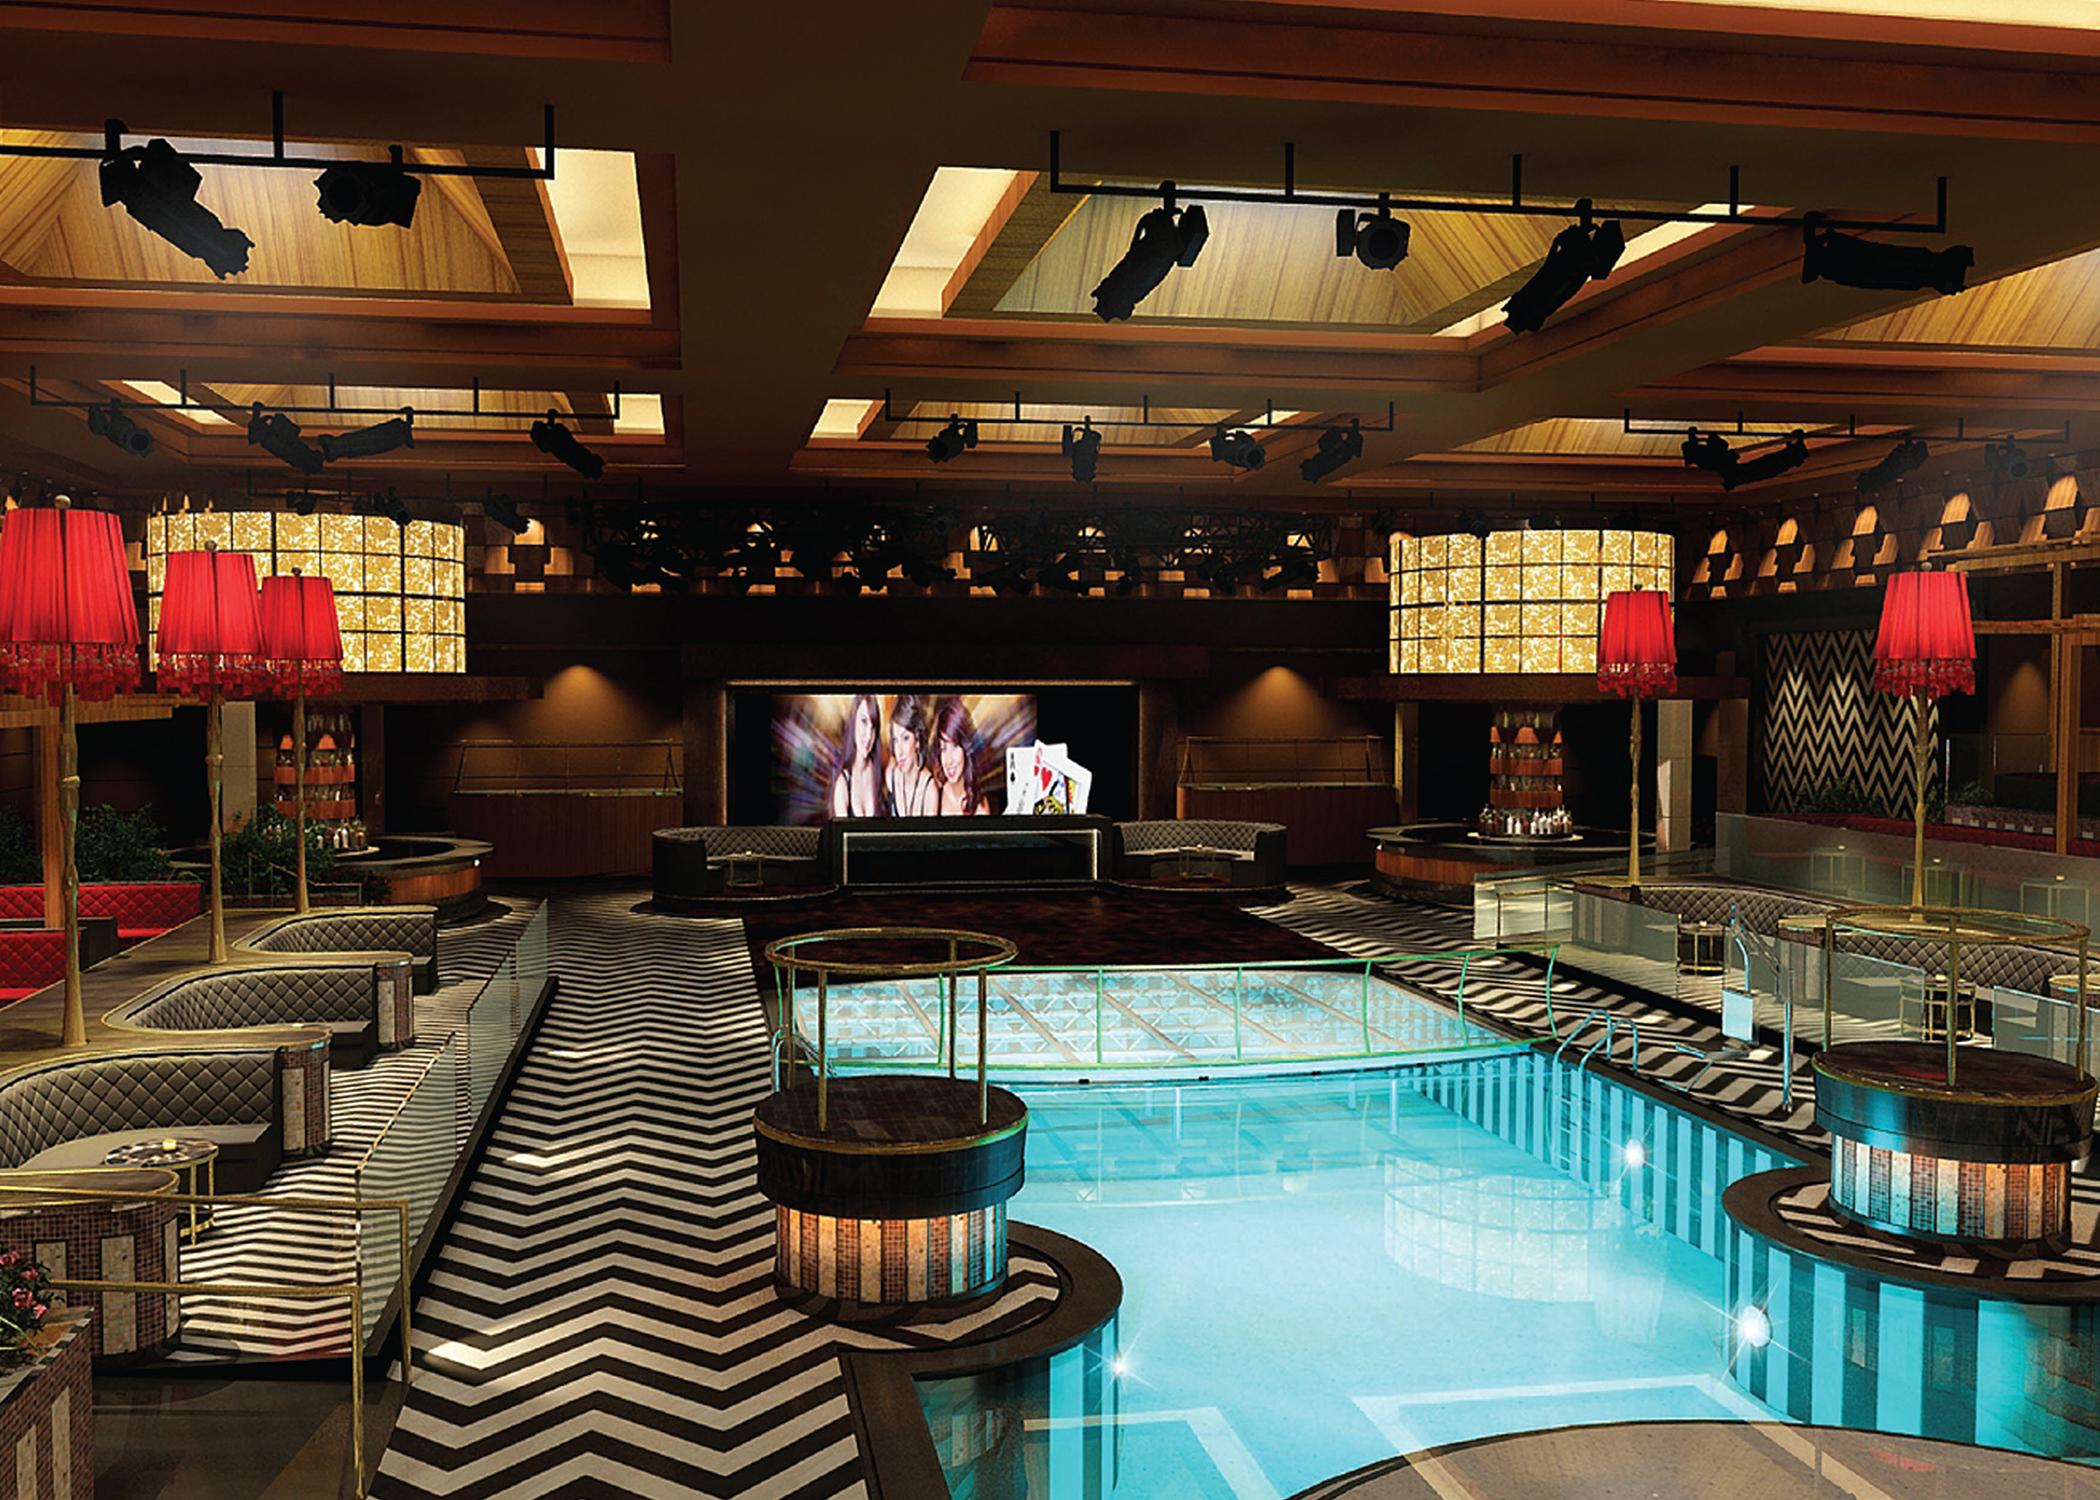 Grand-Sierra-Resort-and-Casino_LEX-Nightclub_Rendering-7x5.png